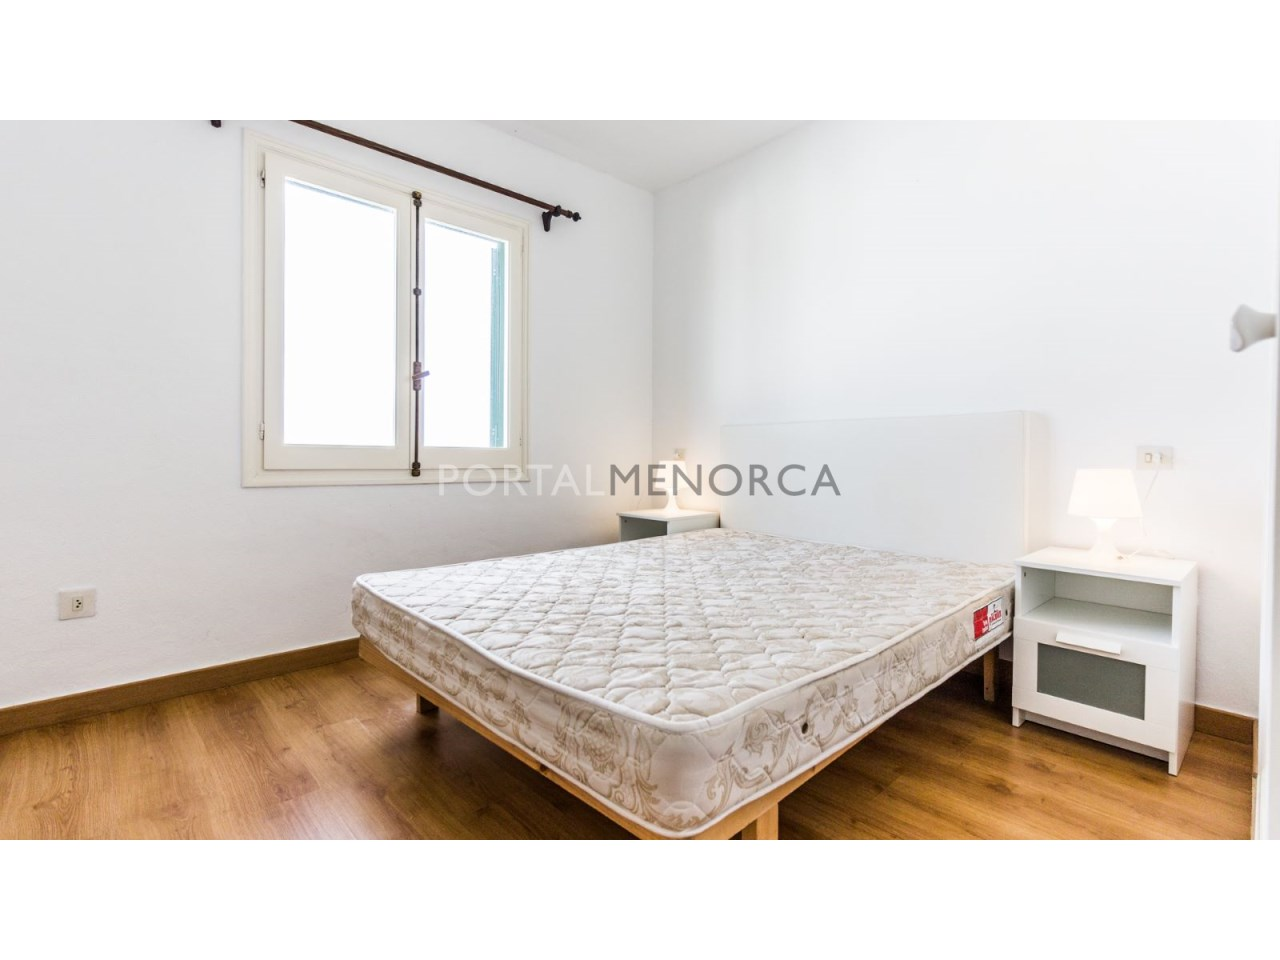 apartamento en venta en Arenal d'en Castell (5 de 14)